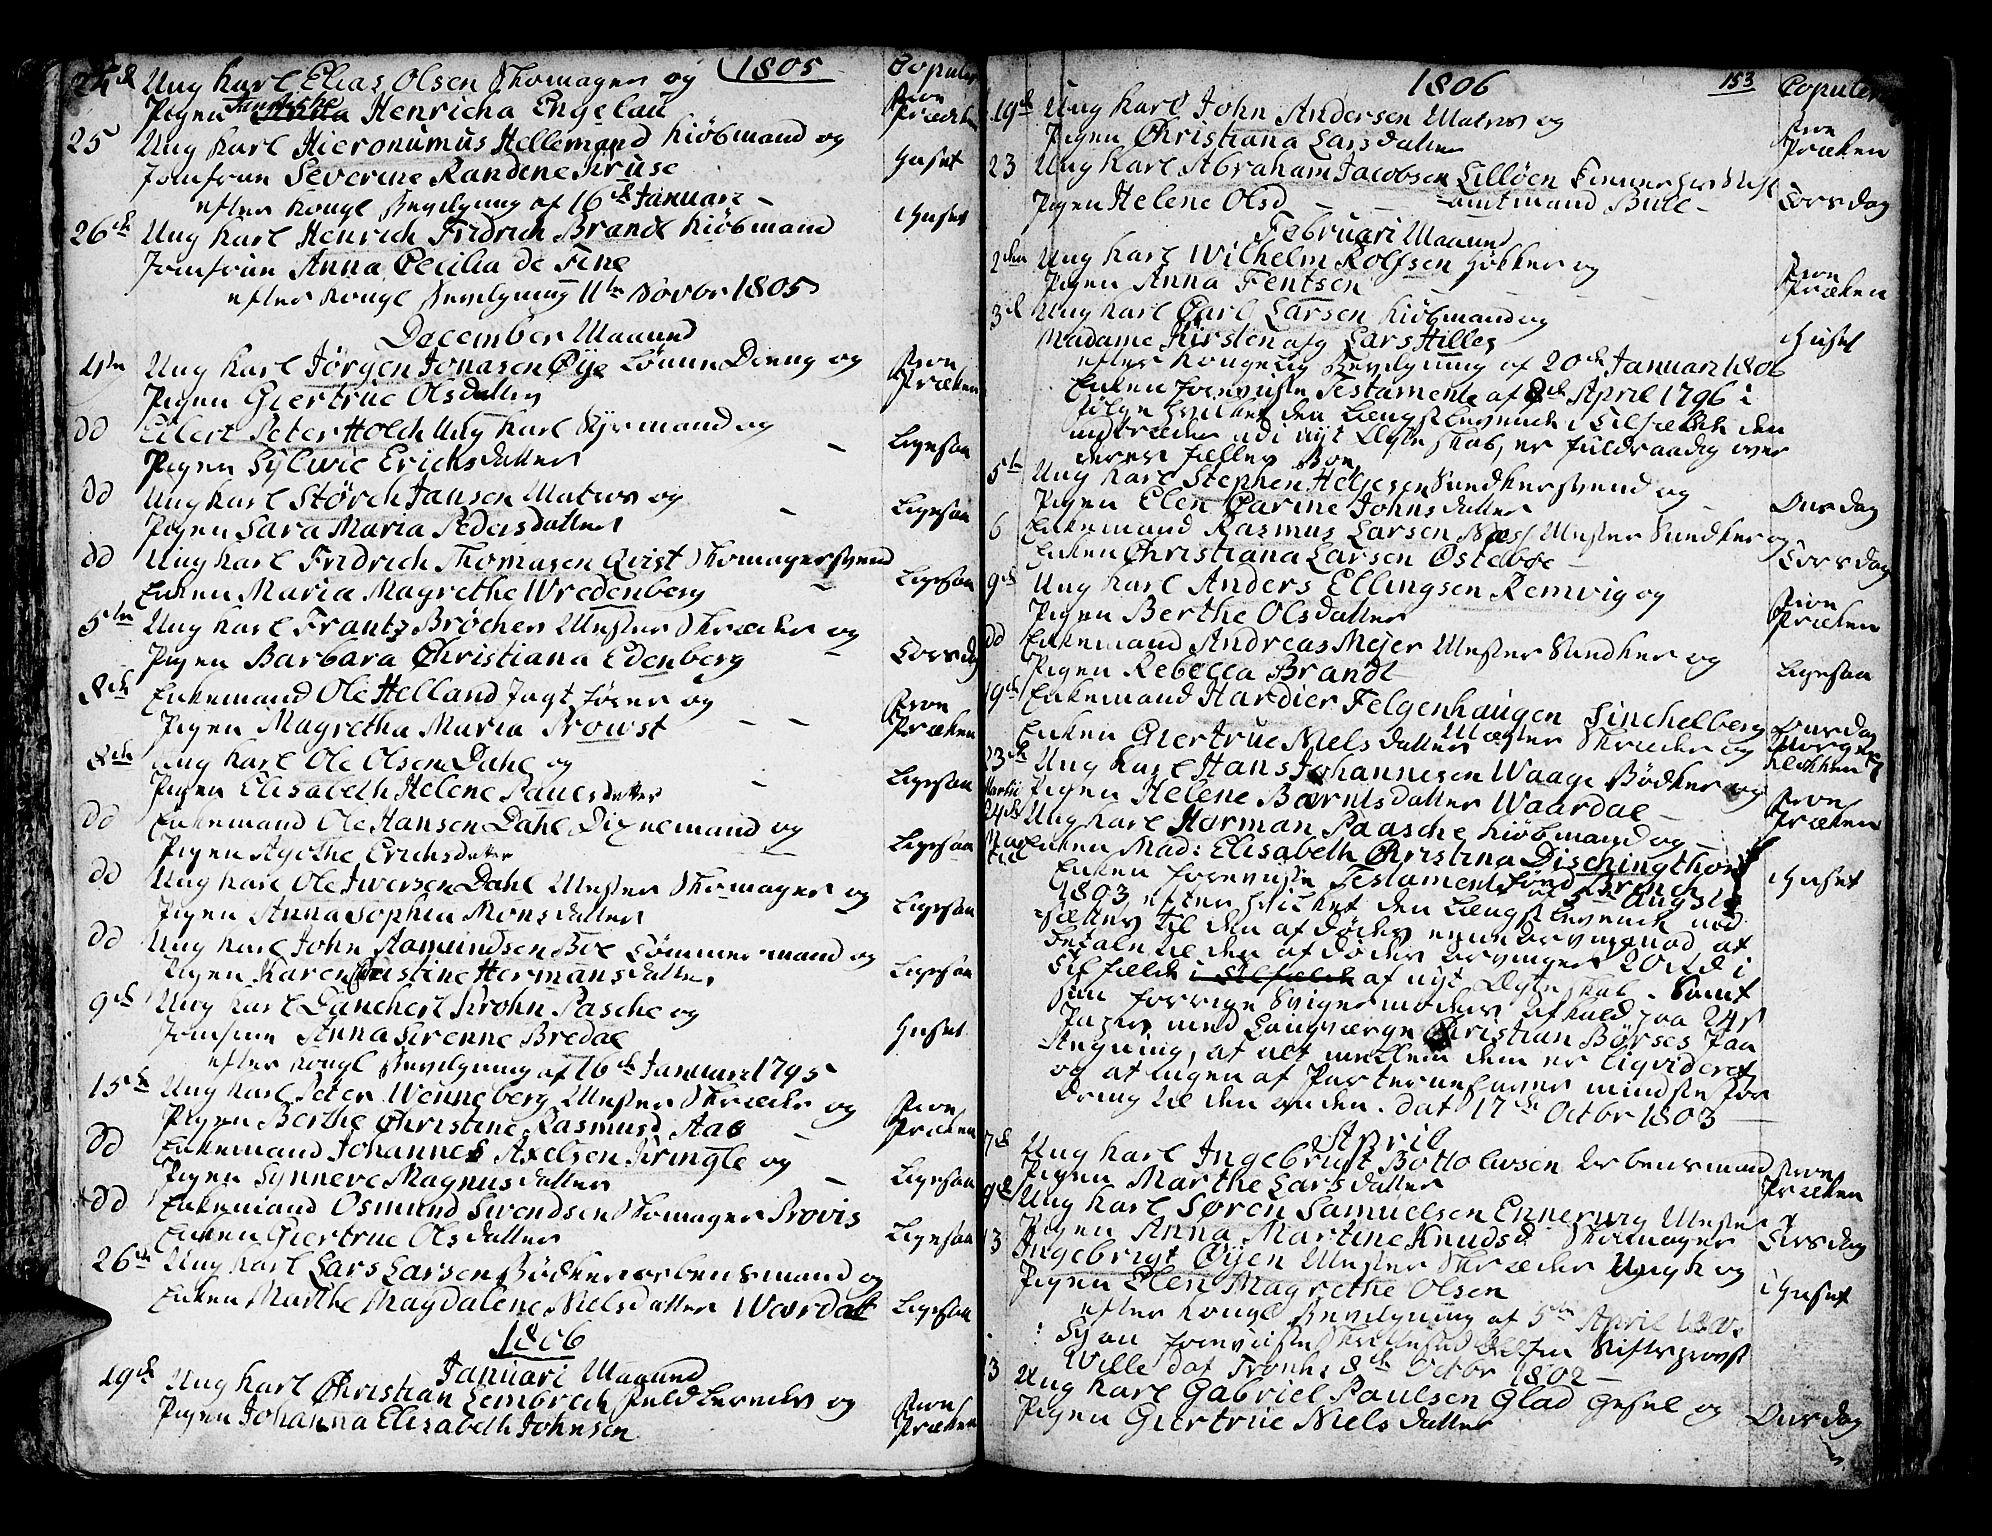 SAB, Domkirken Sokneprestembete, H/Haa/L0007: Ministerialbok nr. A 7, 1725-1826, s. 152-153